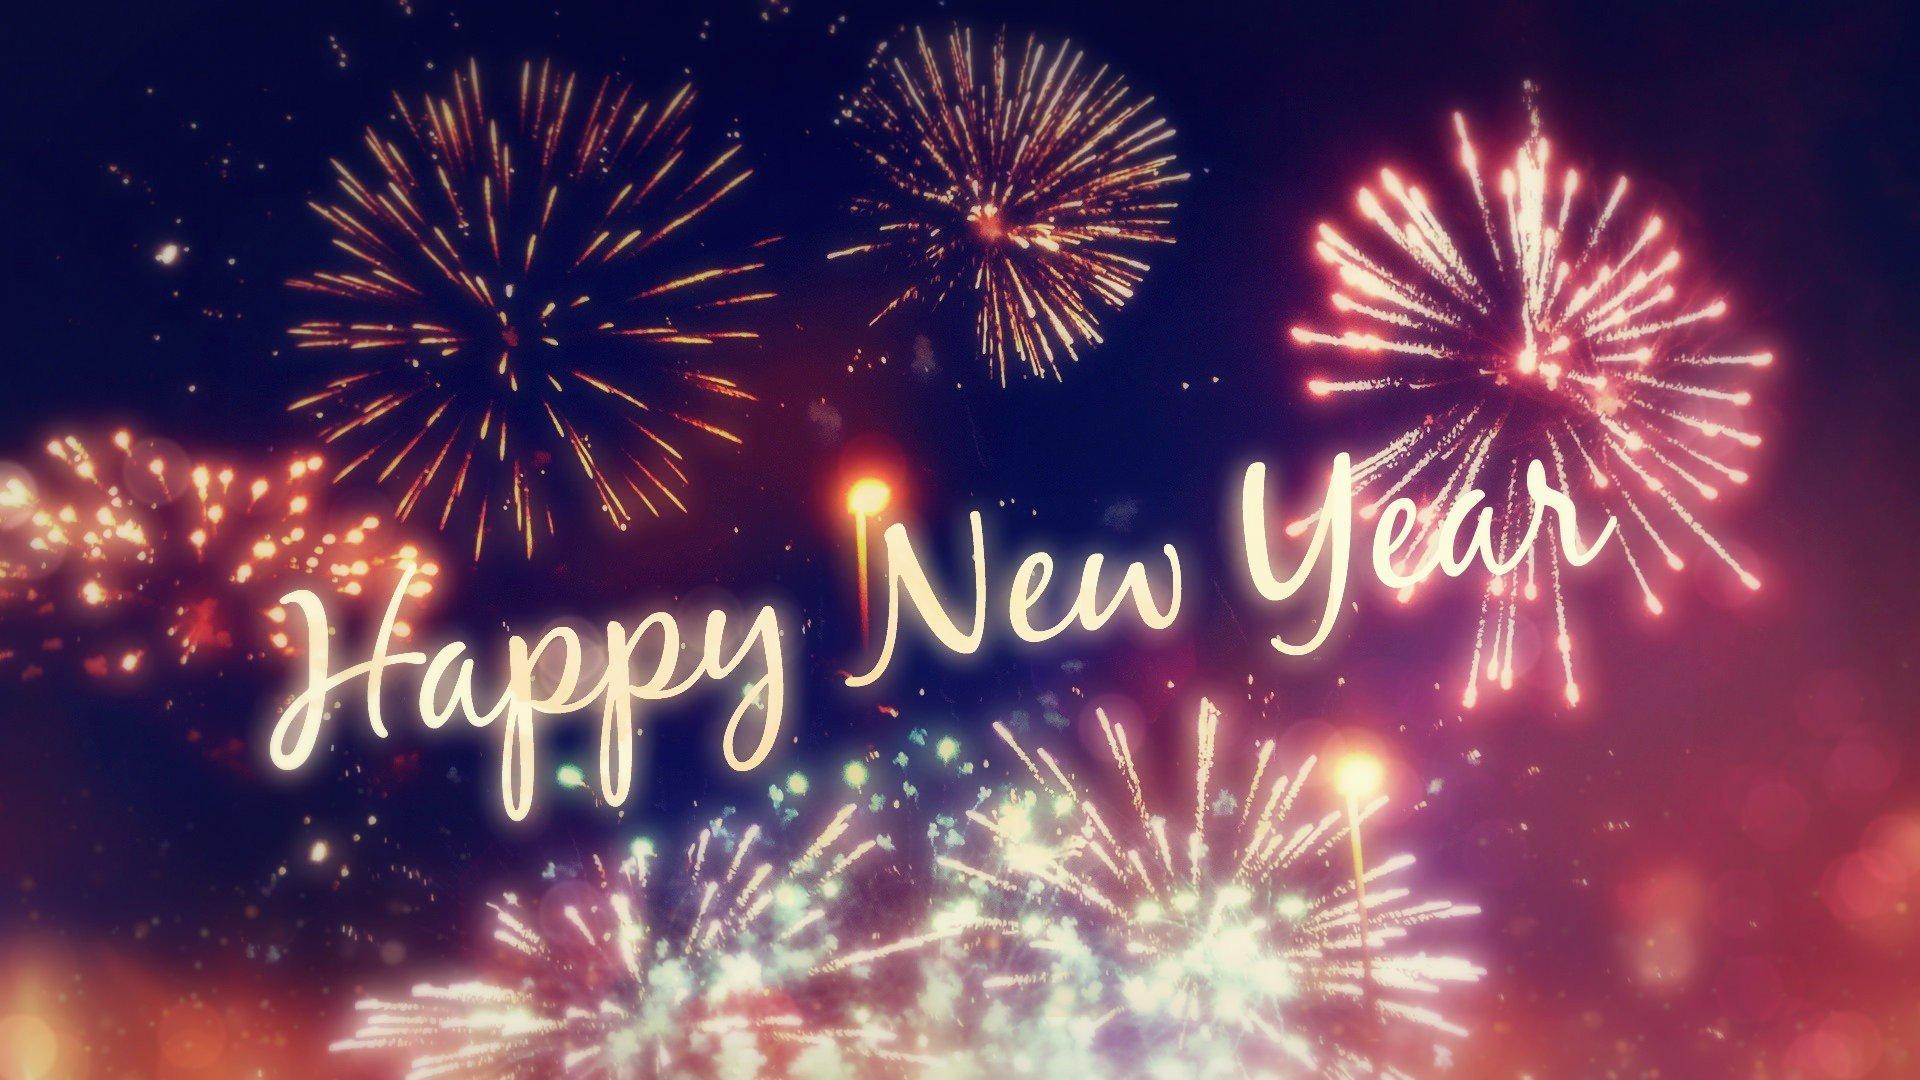 Happy New Year Wallpaper 13 - 1920x1080